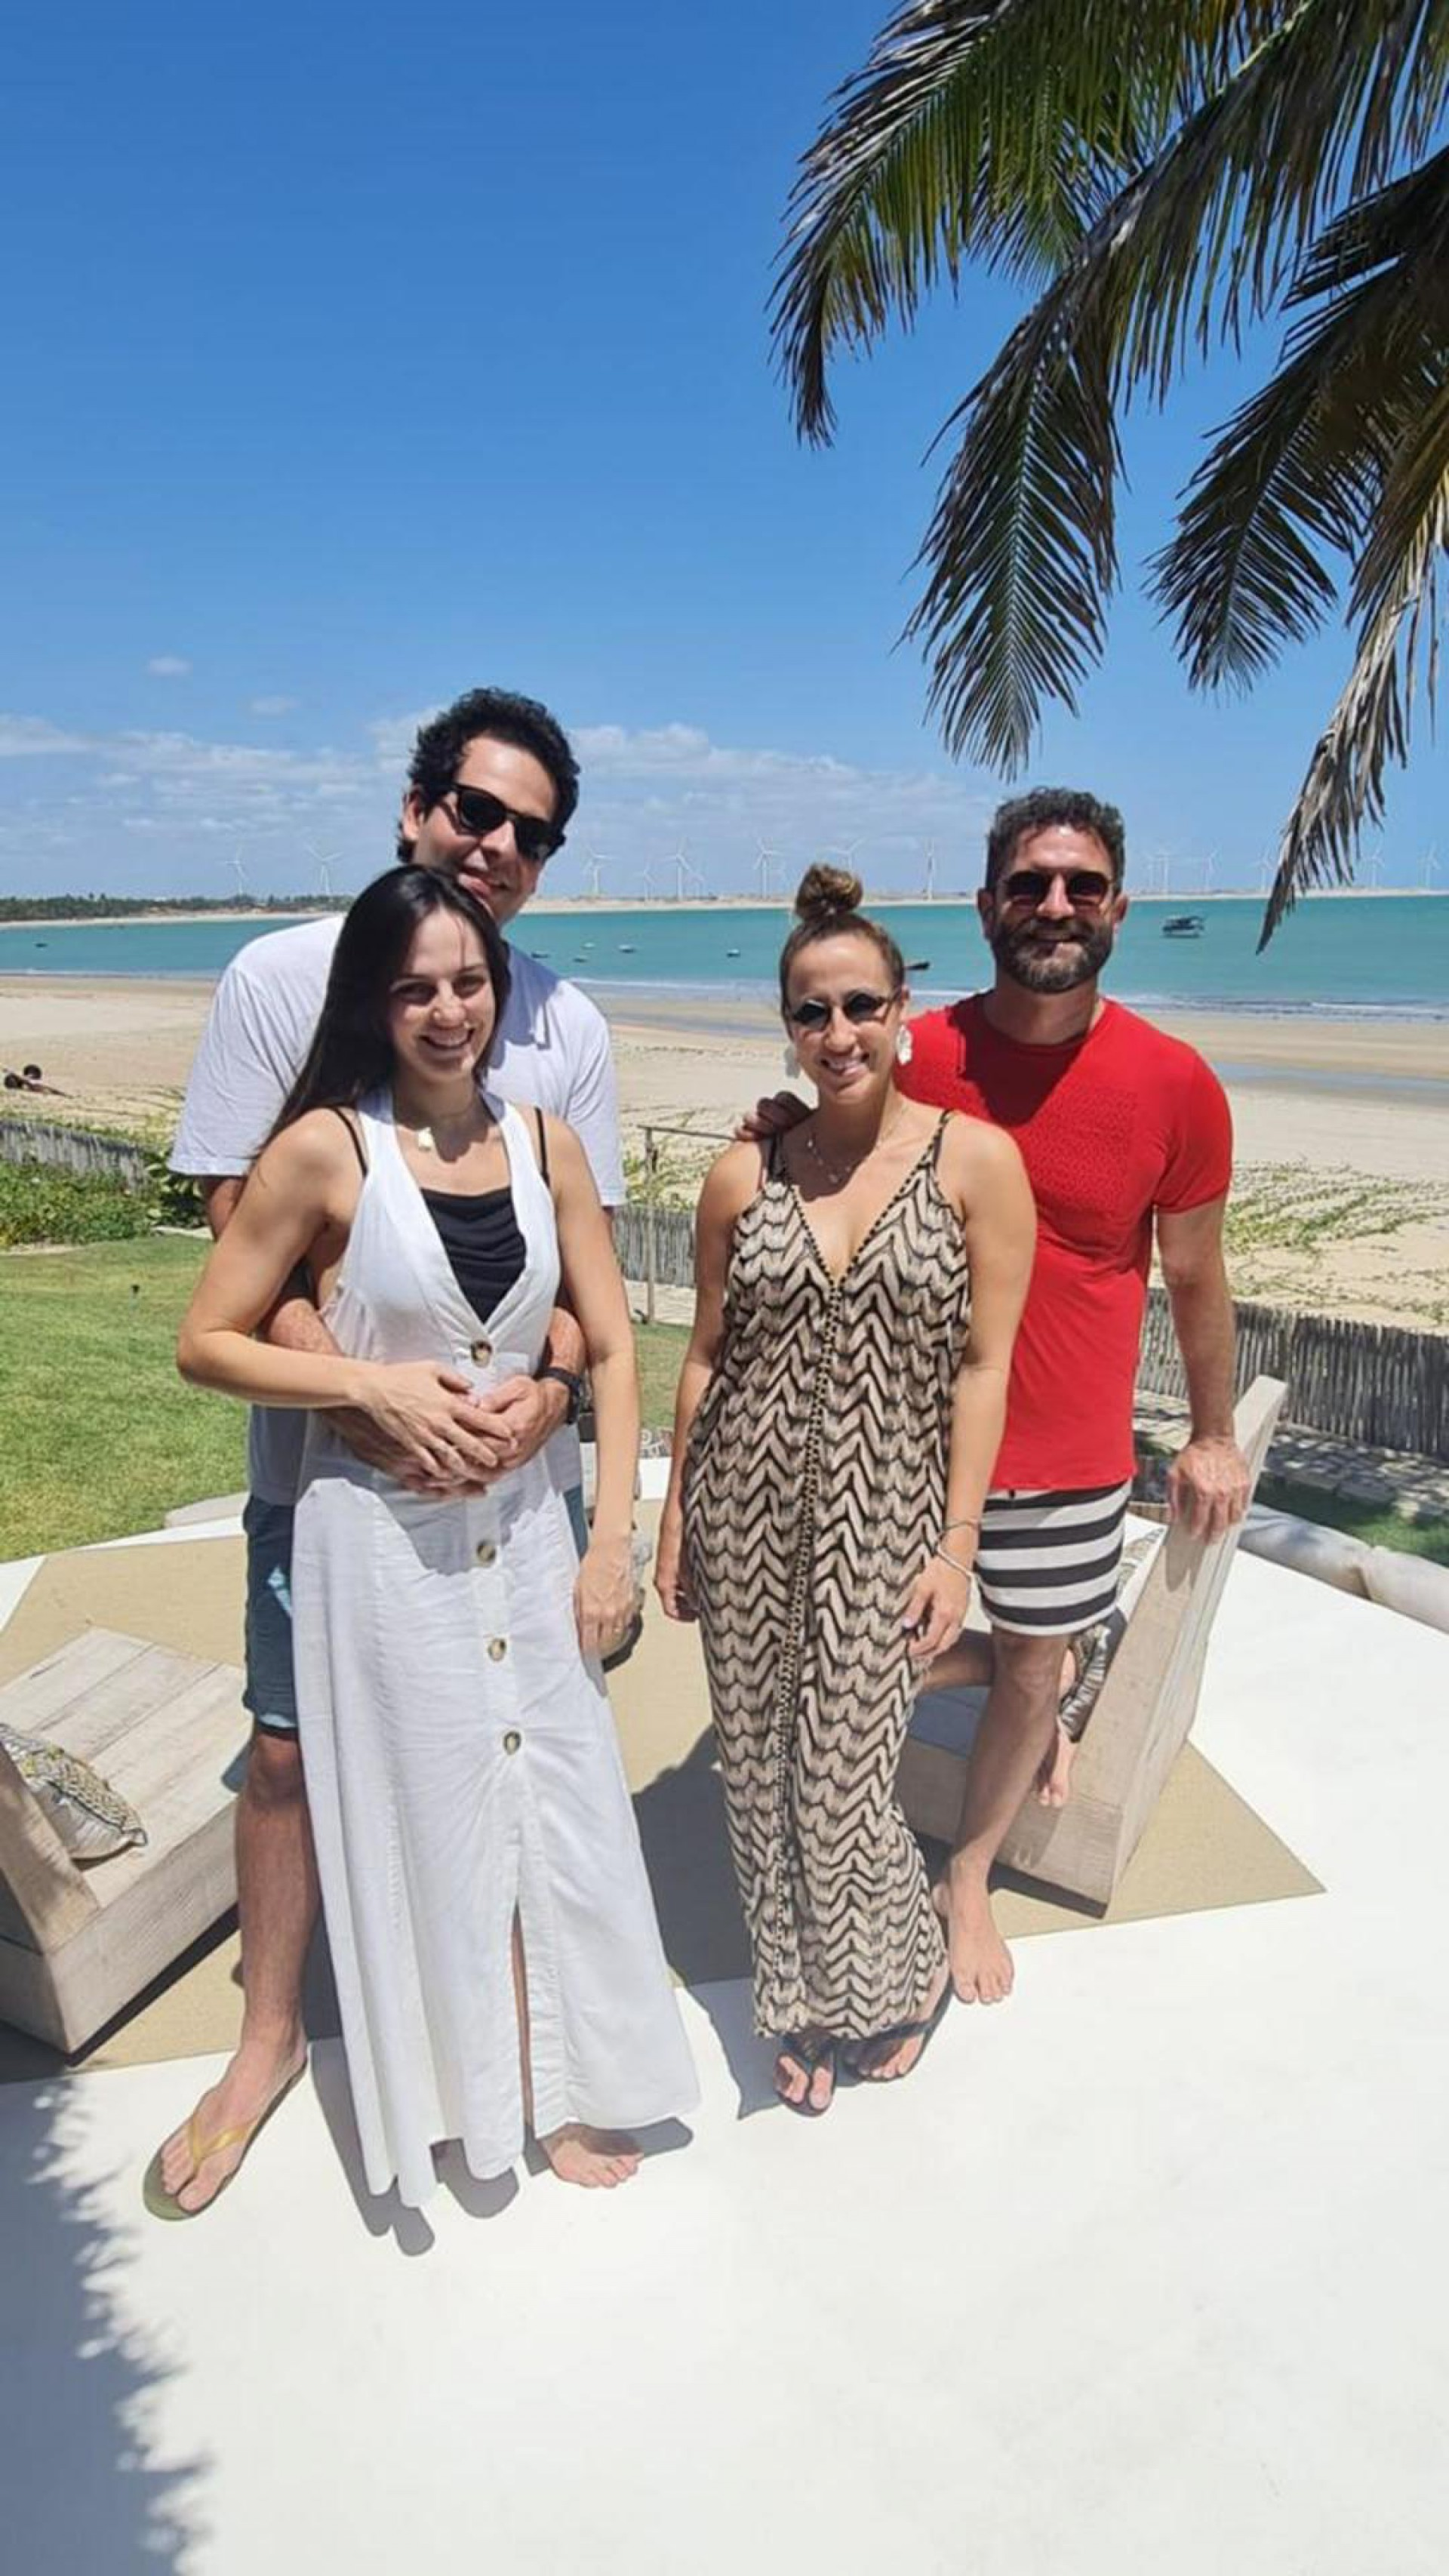 Nathália e João Fiúza Filho, Sasha e Raul Lira